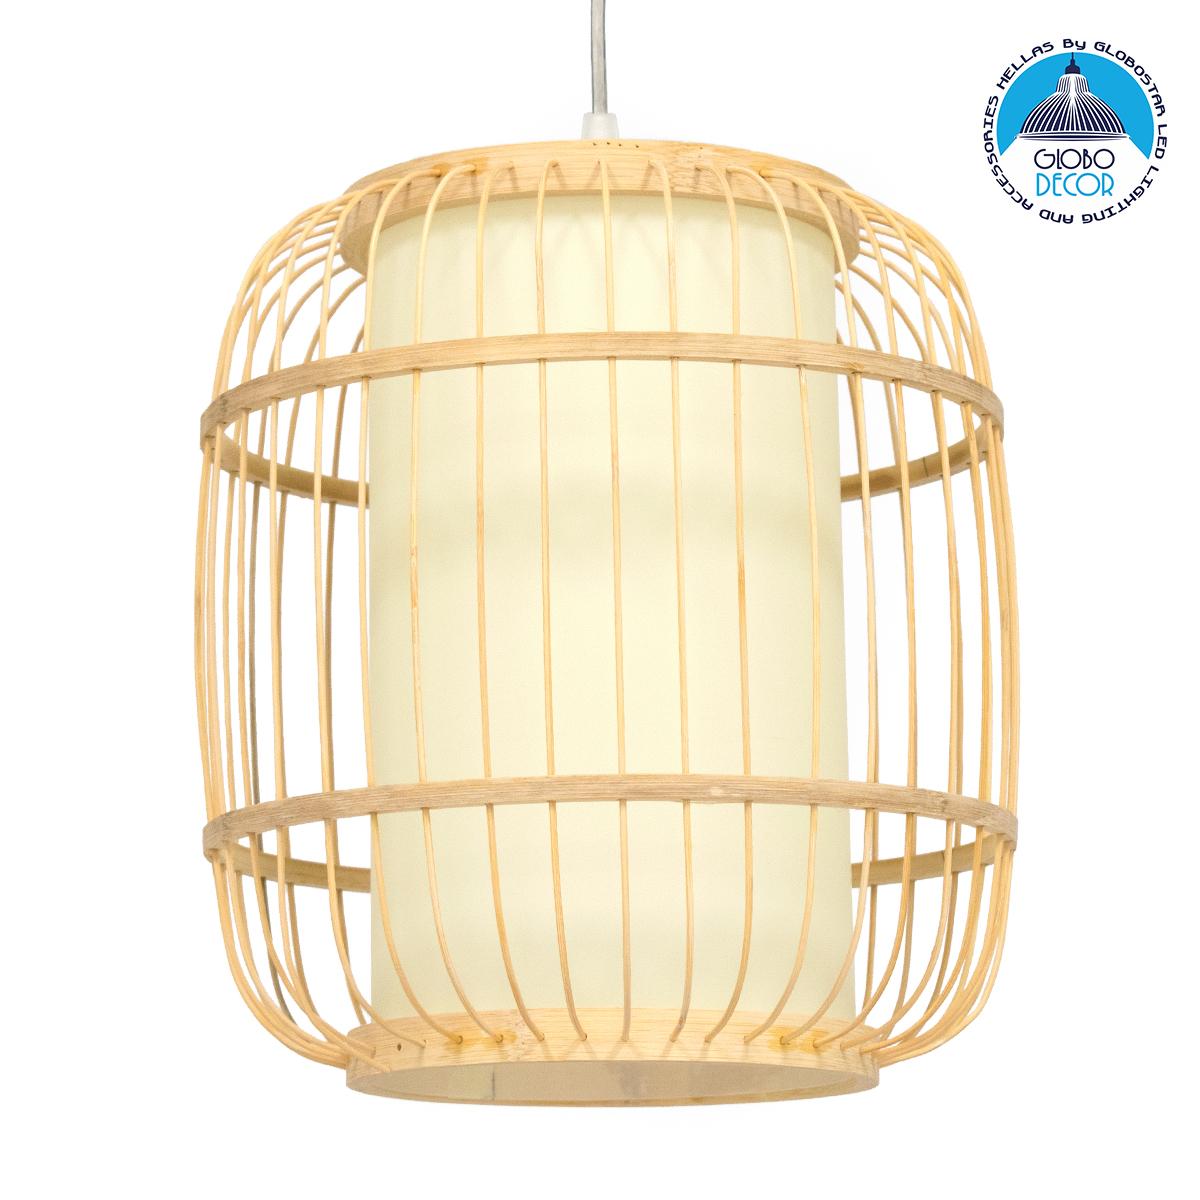 GloboStar® DE PARIS 01633 Vintage Κρεμαστό Φωτιστικό Οροφής Μονόφωτο Μπεζ Ξύλινο Bamboo Φ26 x Y32cm